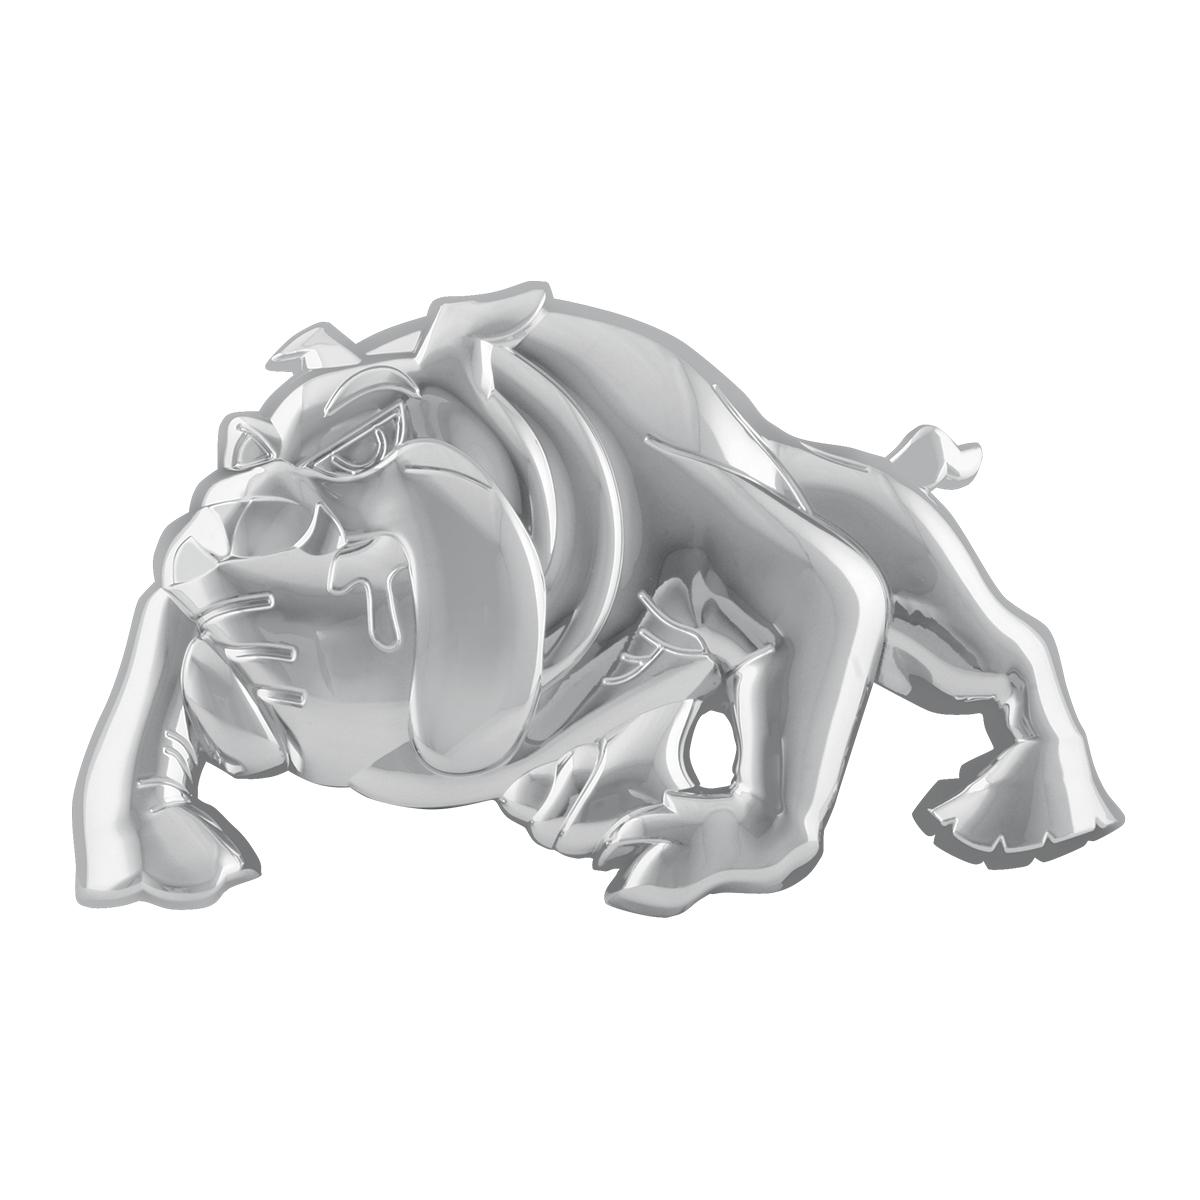 #94260 Chrome Plastic Bulldog Accent w/Studs - Facing Left